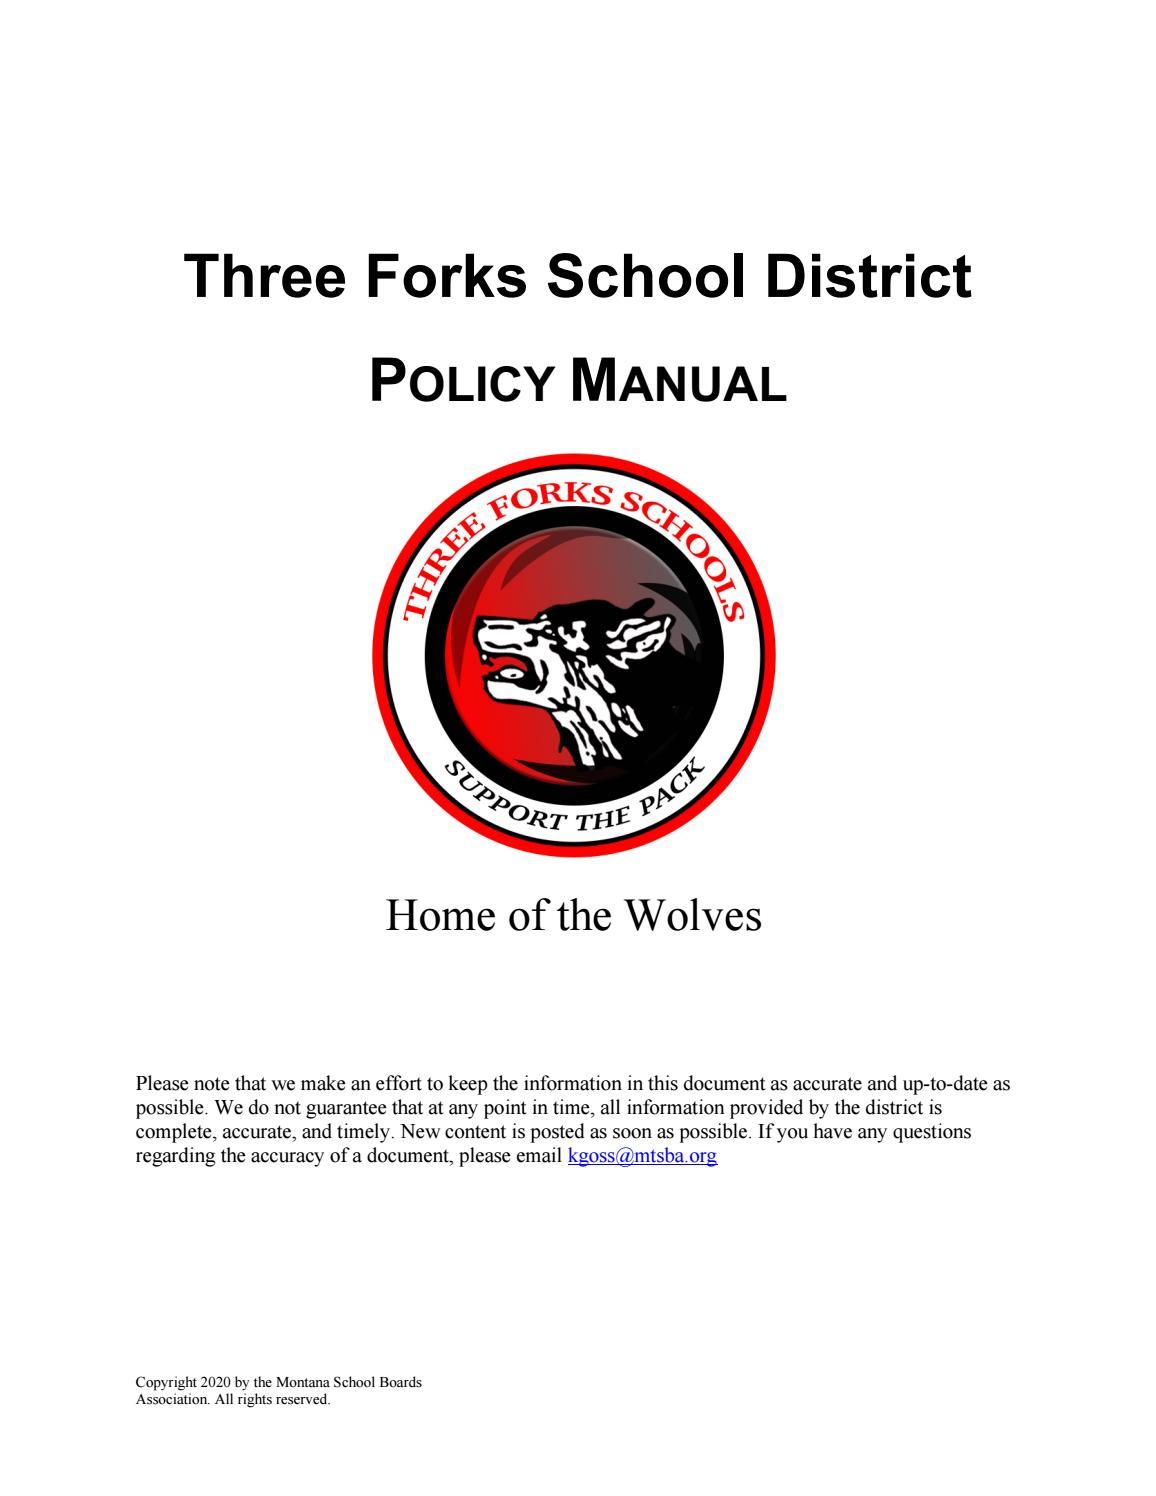 Three Forks Public Schools Policy Manual By Montana School Boards Association Issuu